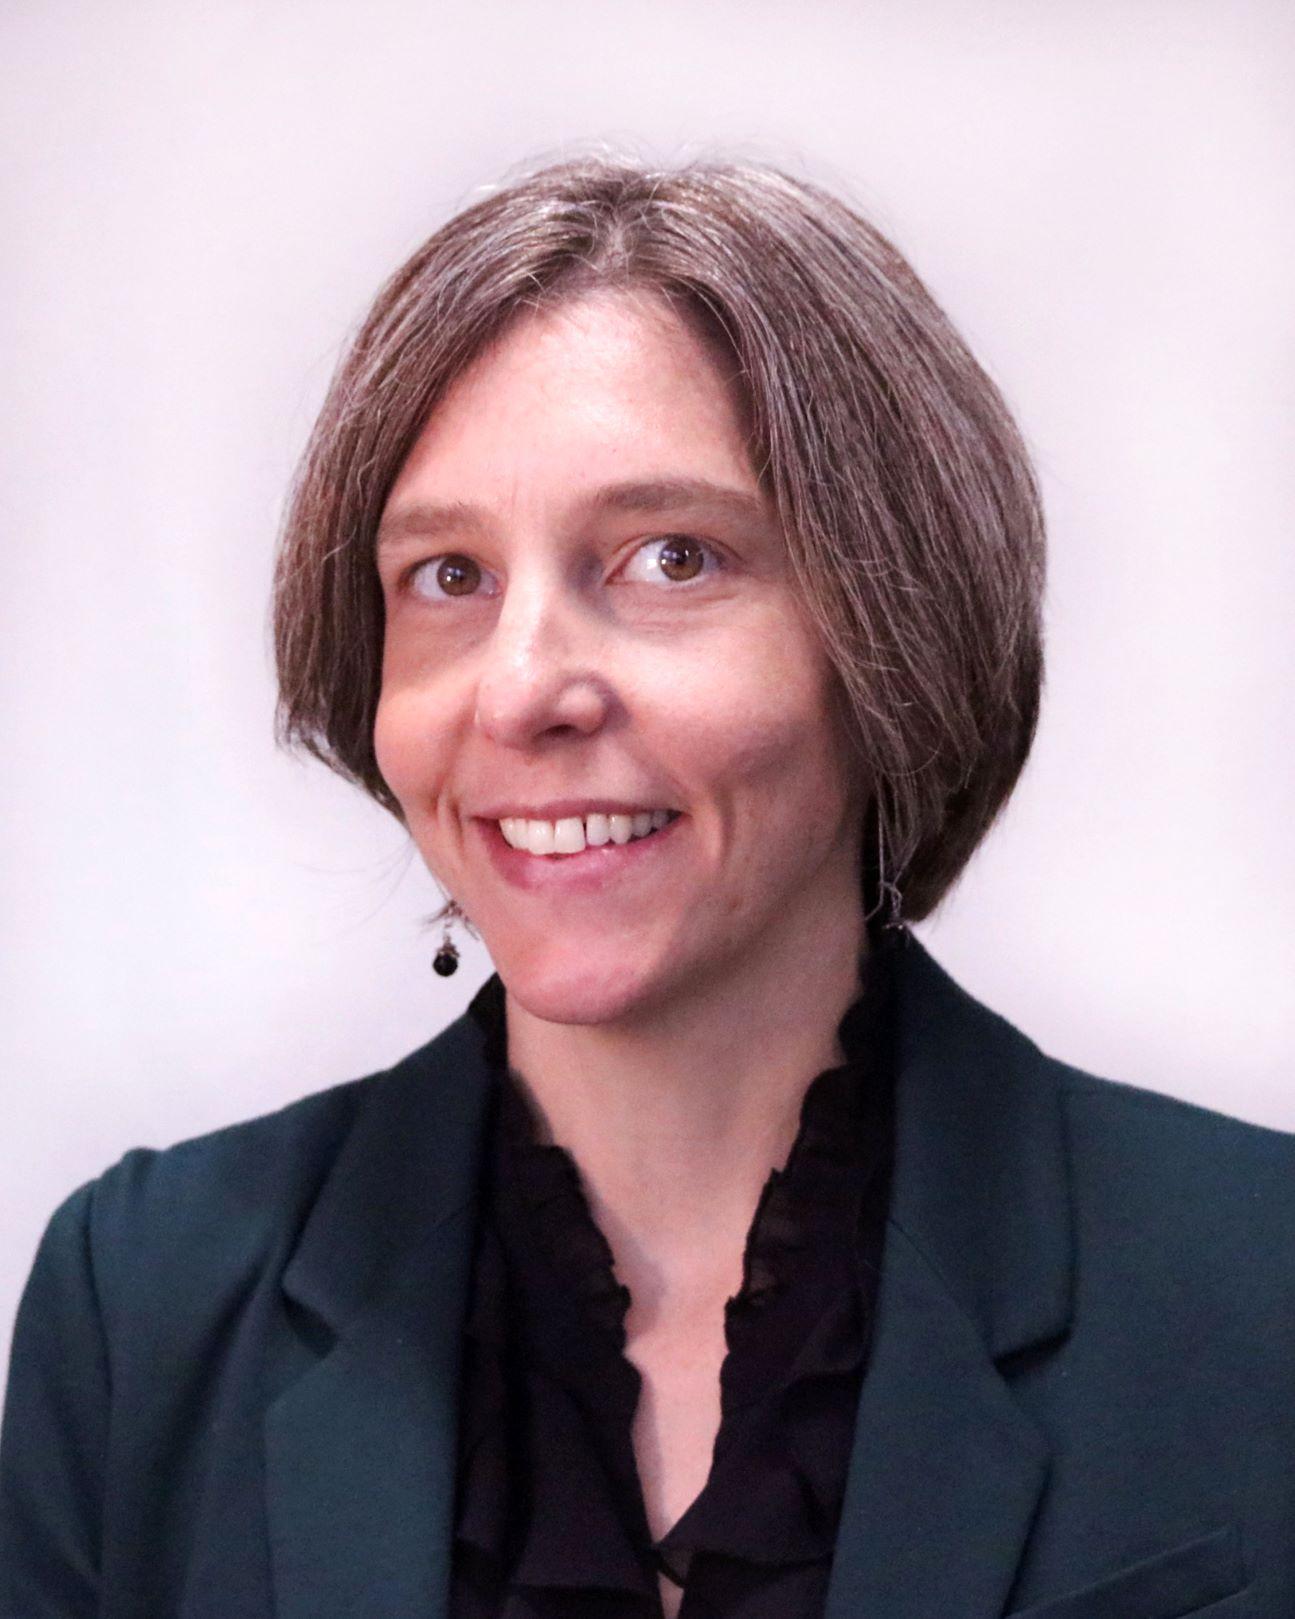 Erin Drinnin